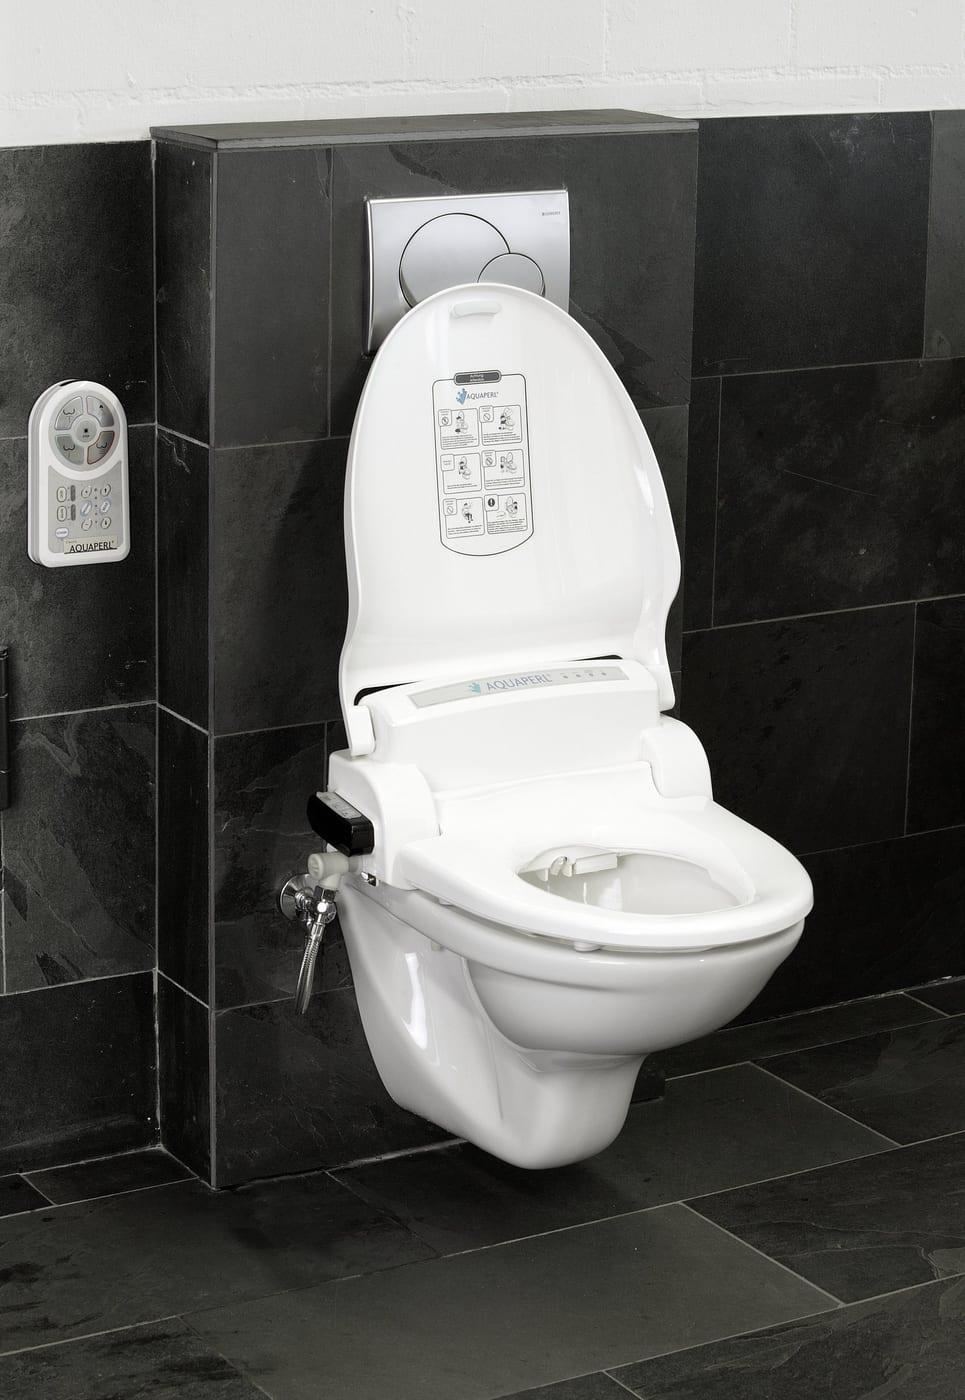 do it garden wc douche aquaperl avec telecommande migros. Black Bedroom Furniture Sets. Home Design Ideas